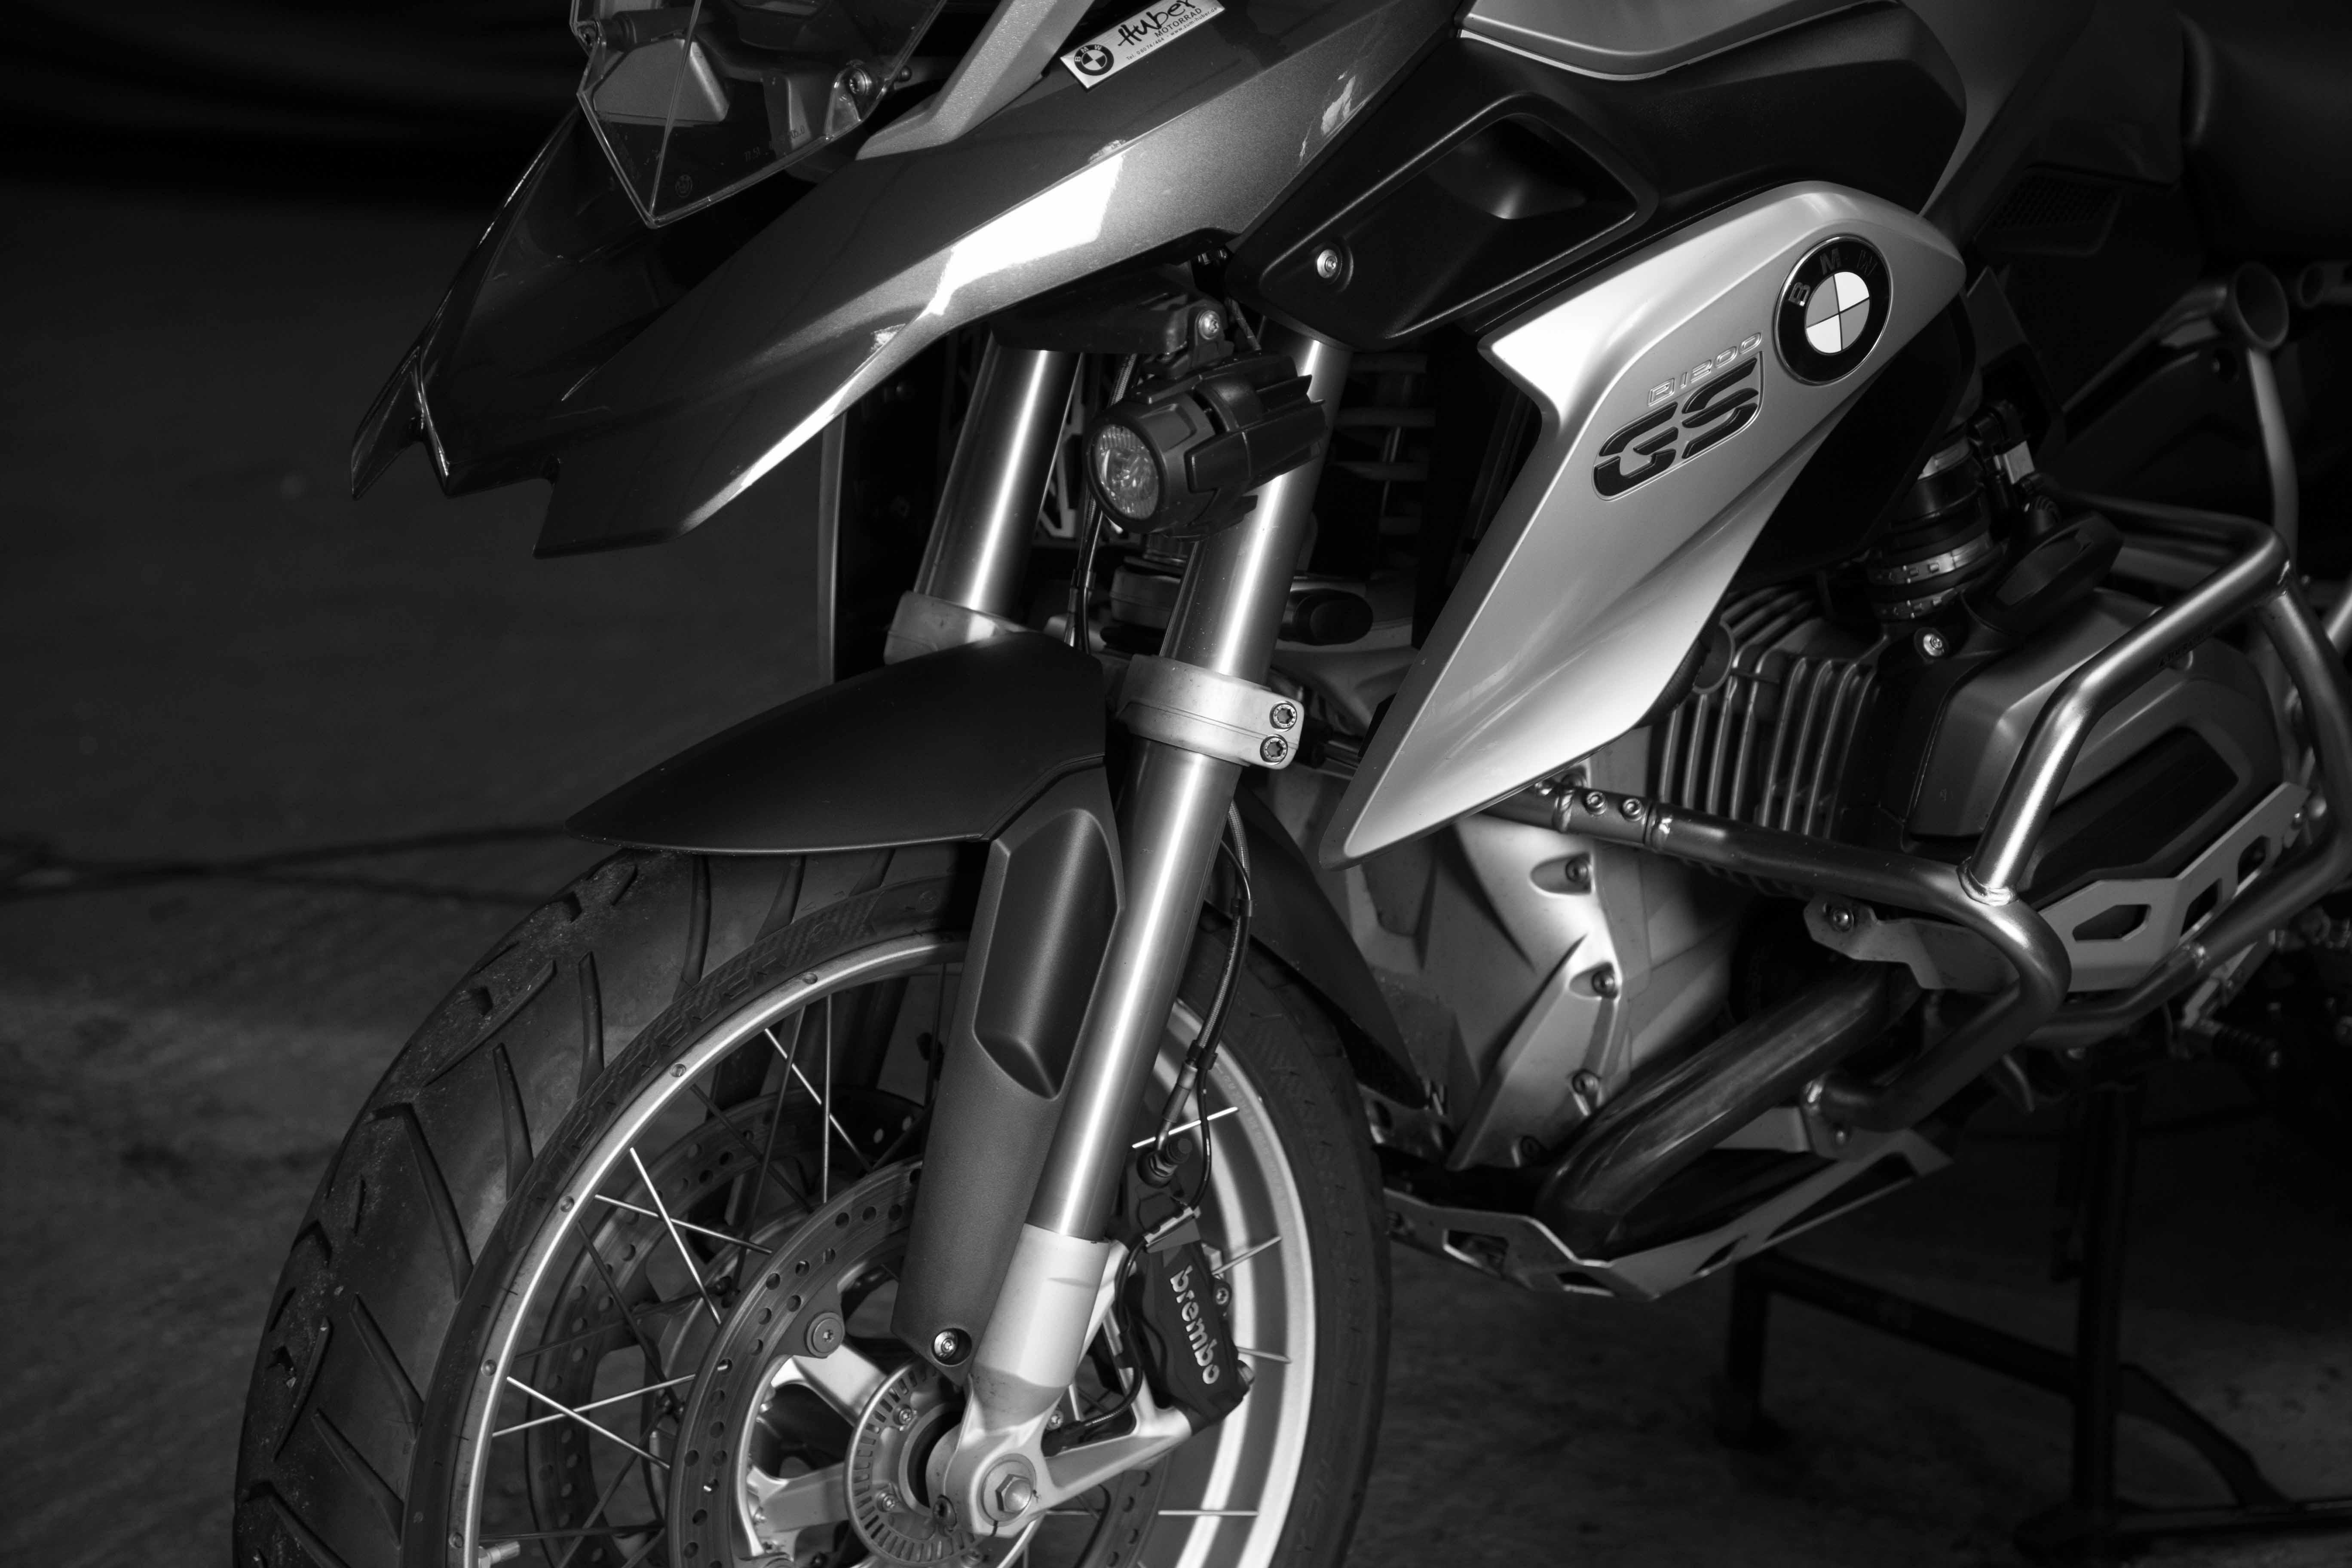 Motorbike Storage